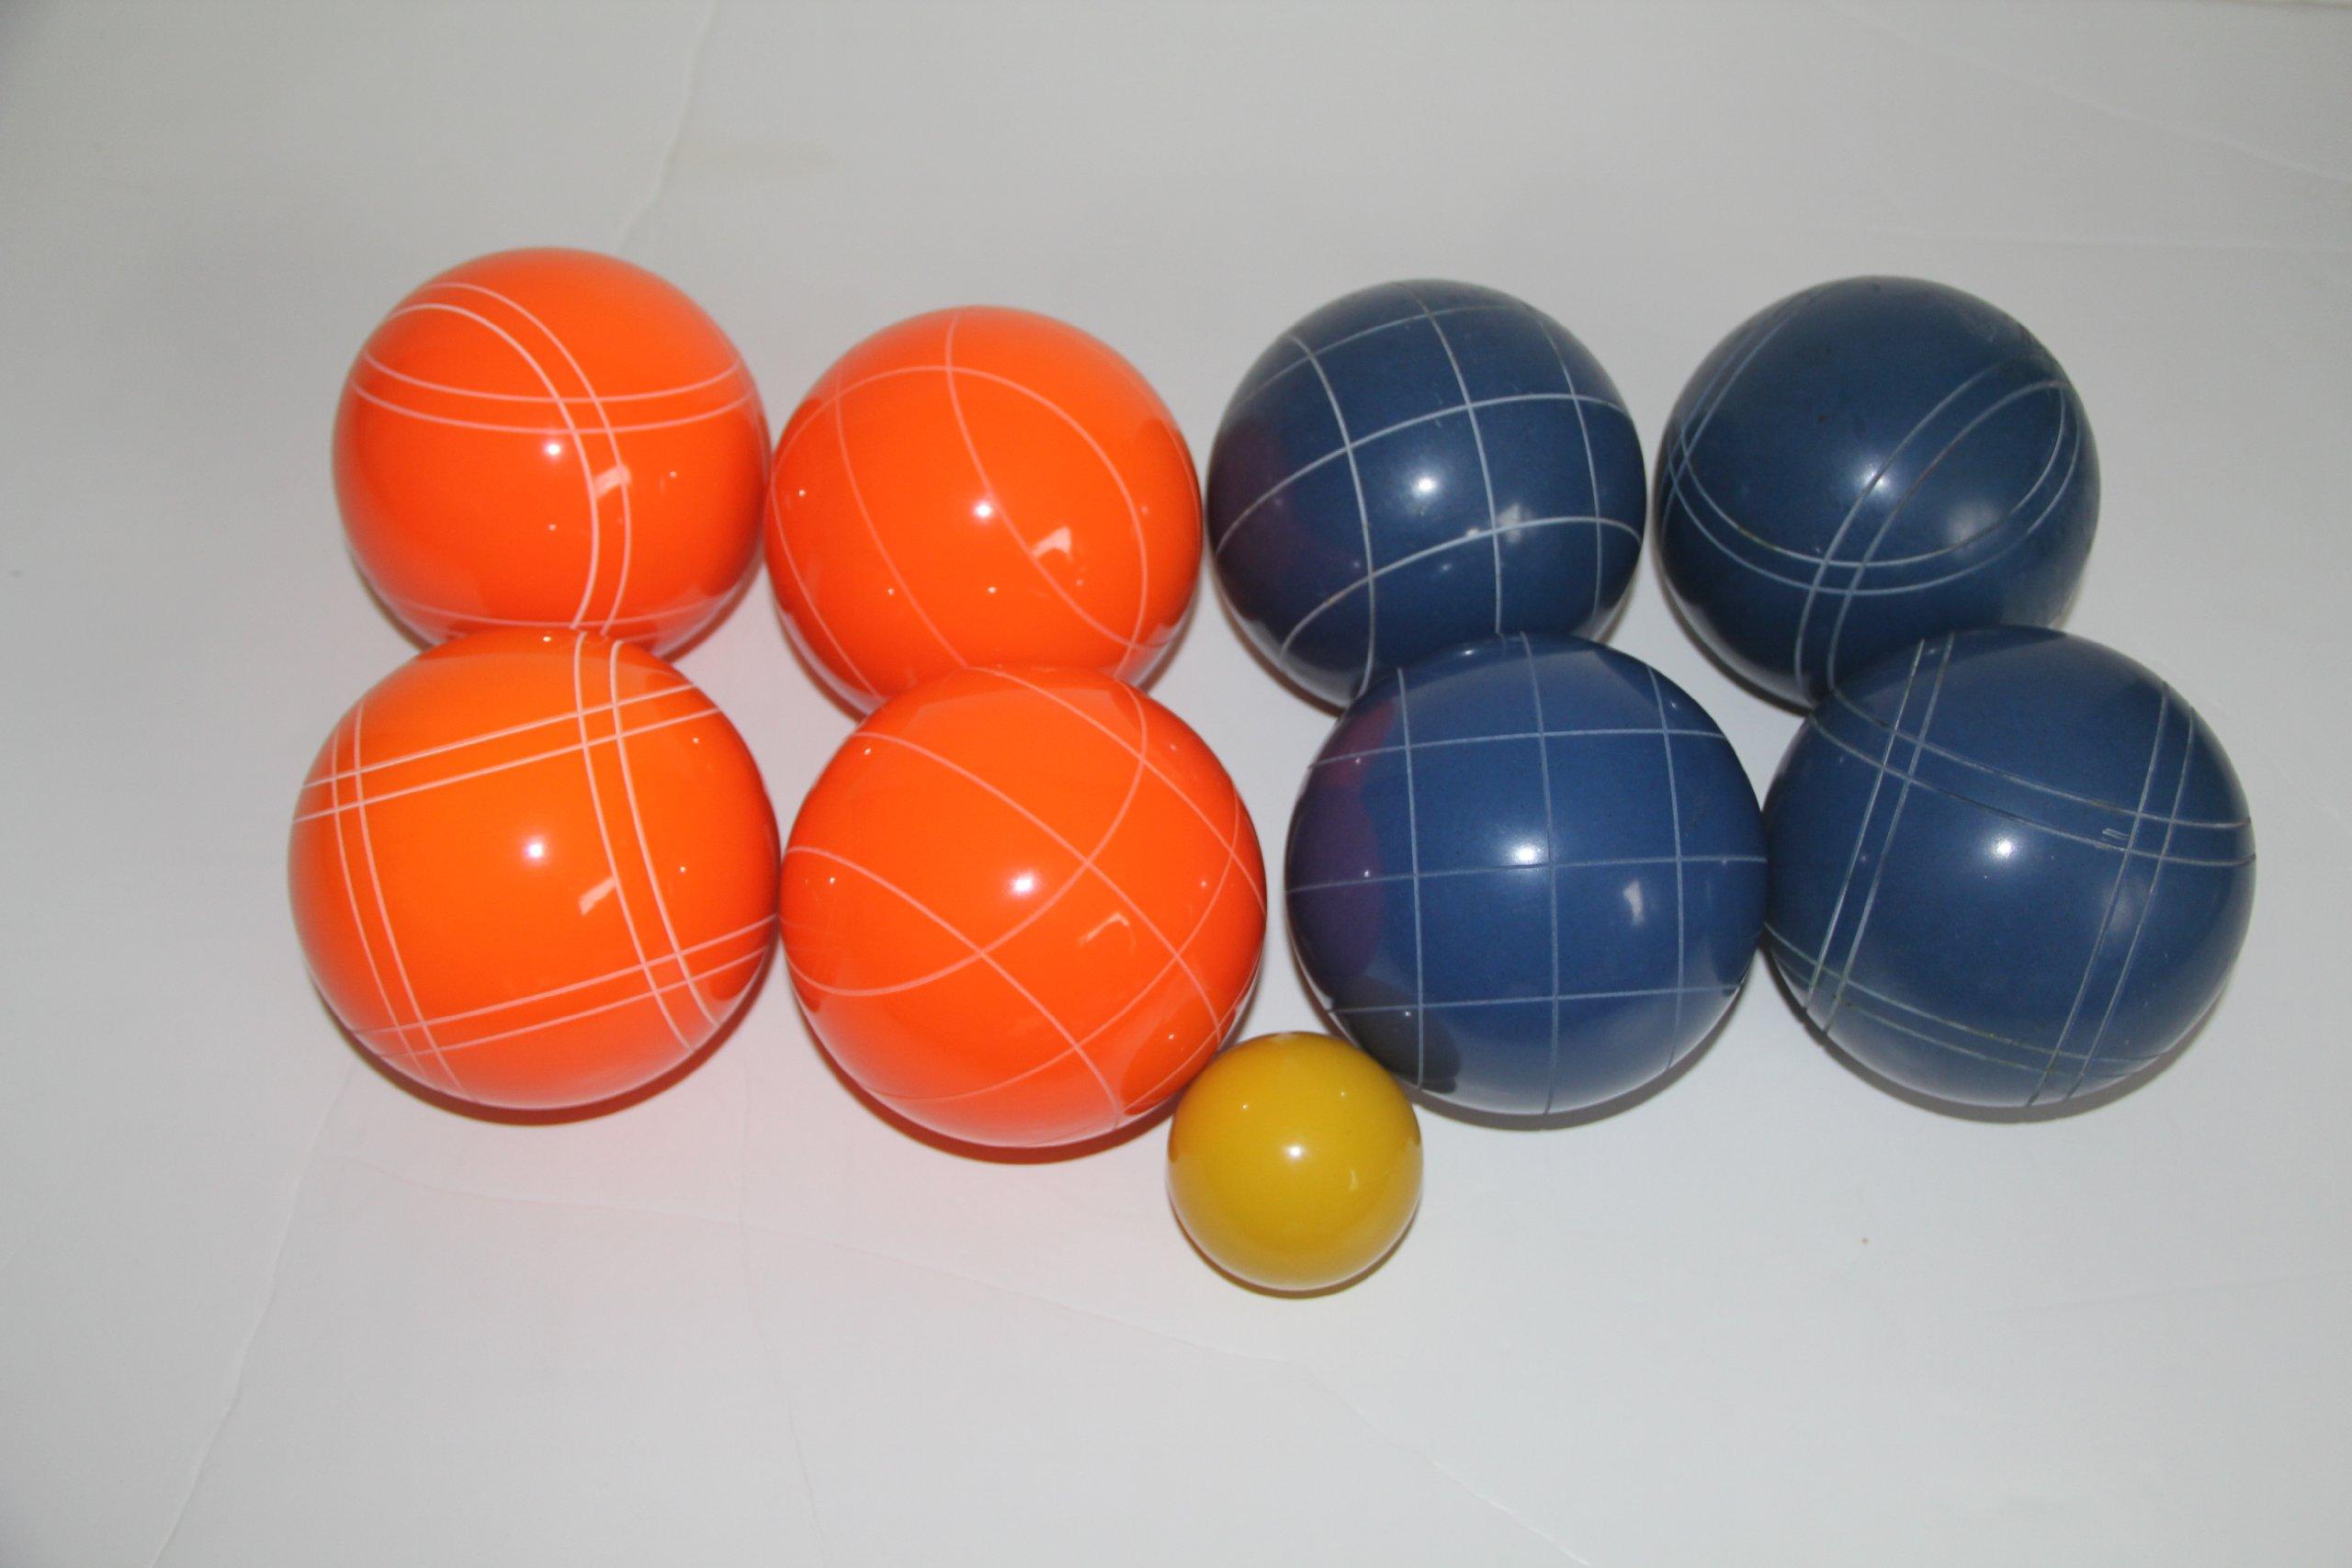 Premium Quality EPCO Tournament Set - 110mm Blue and Orange Bocce Balls - NO BAG OPTION [Toy] by Epco